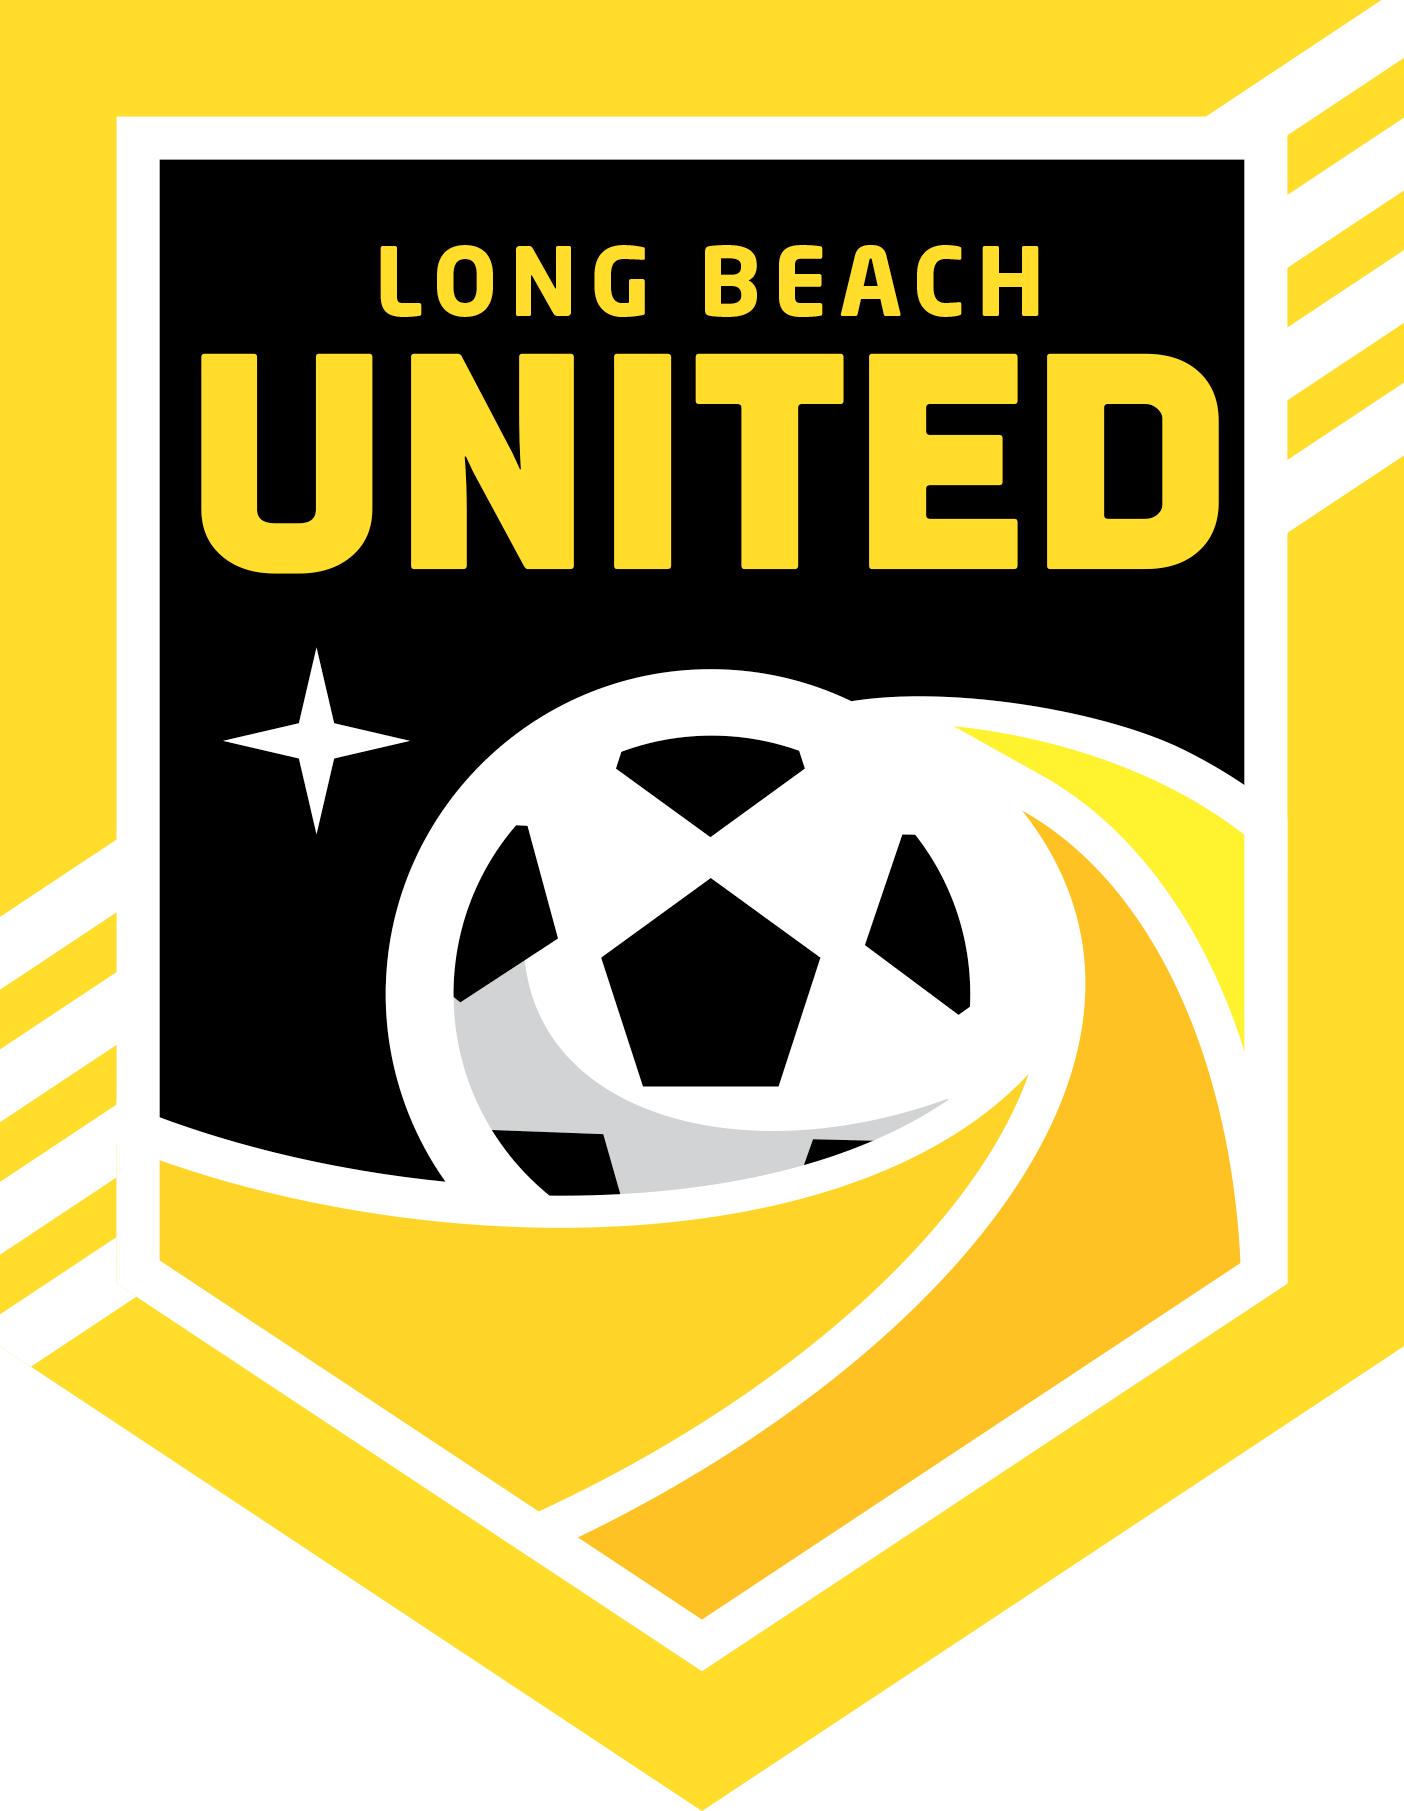 Long Beach United